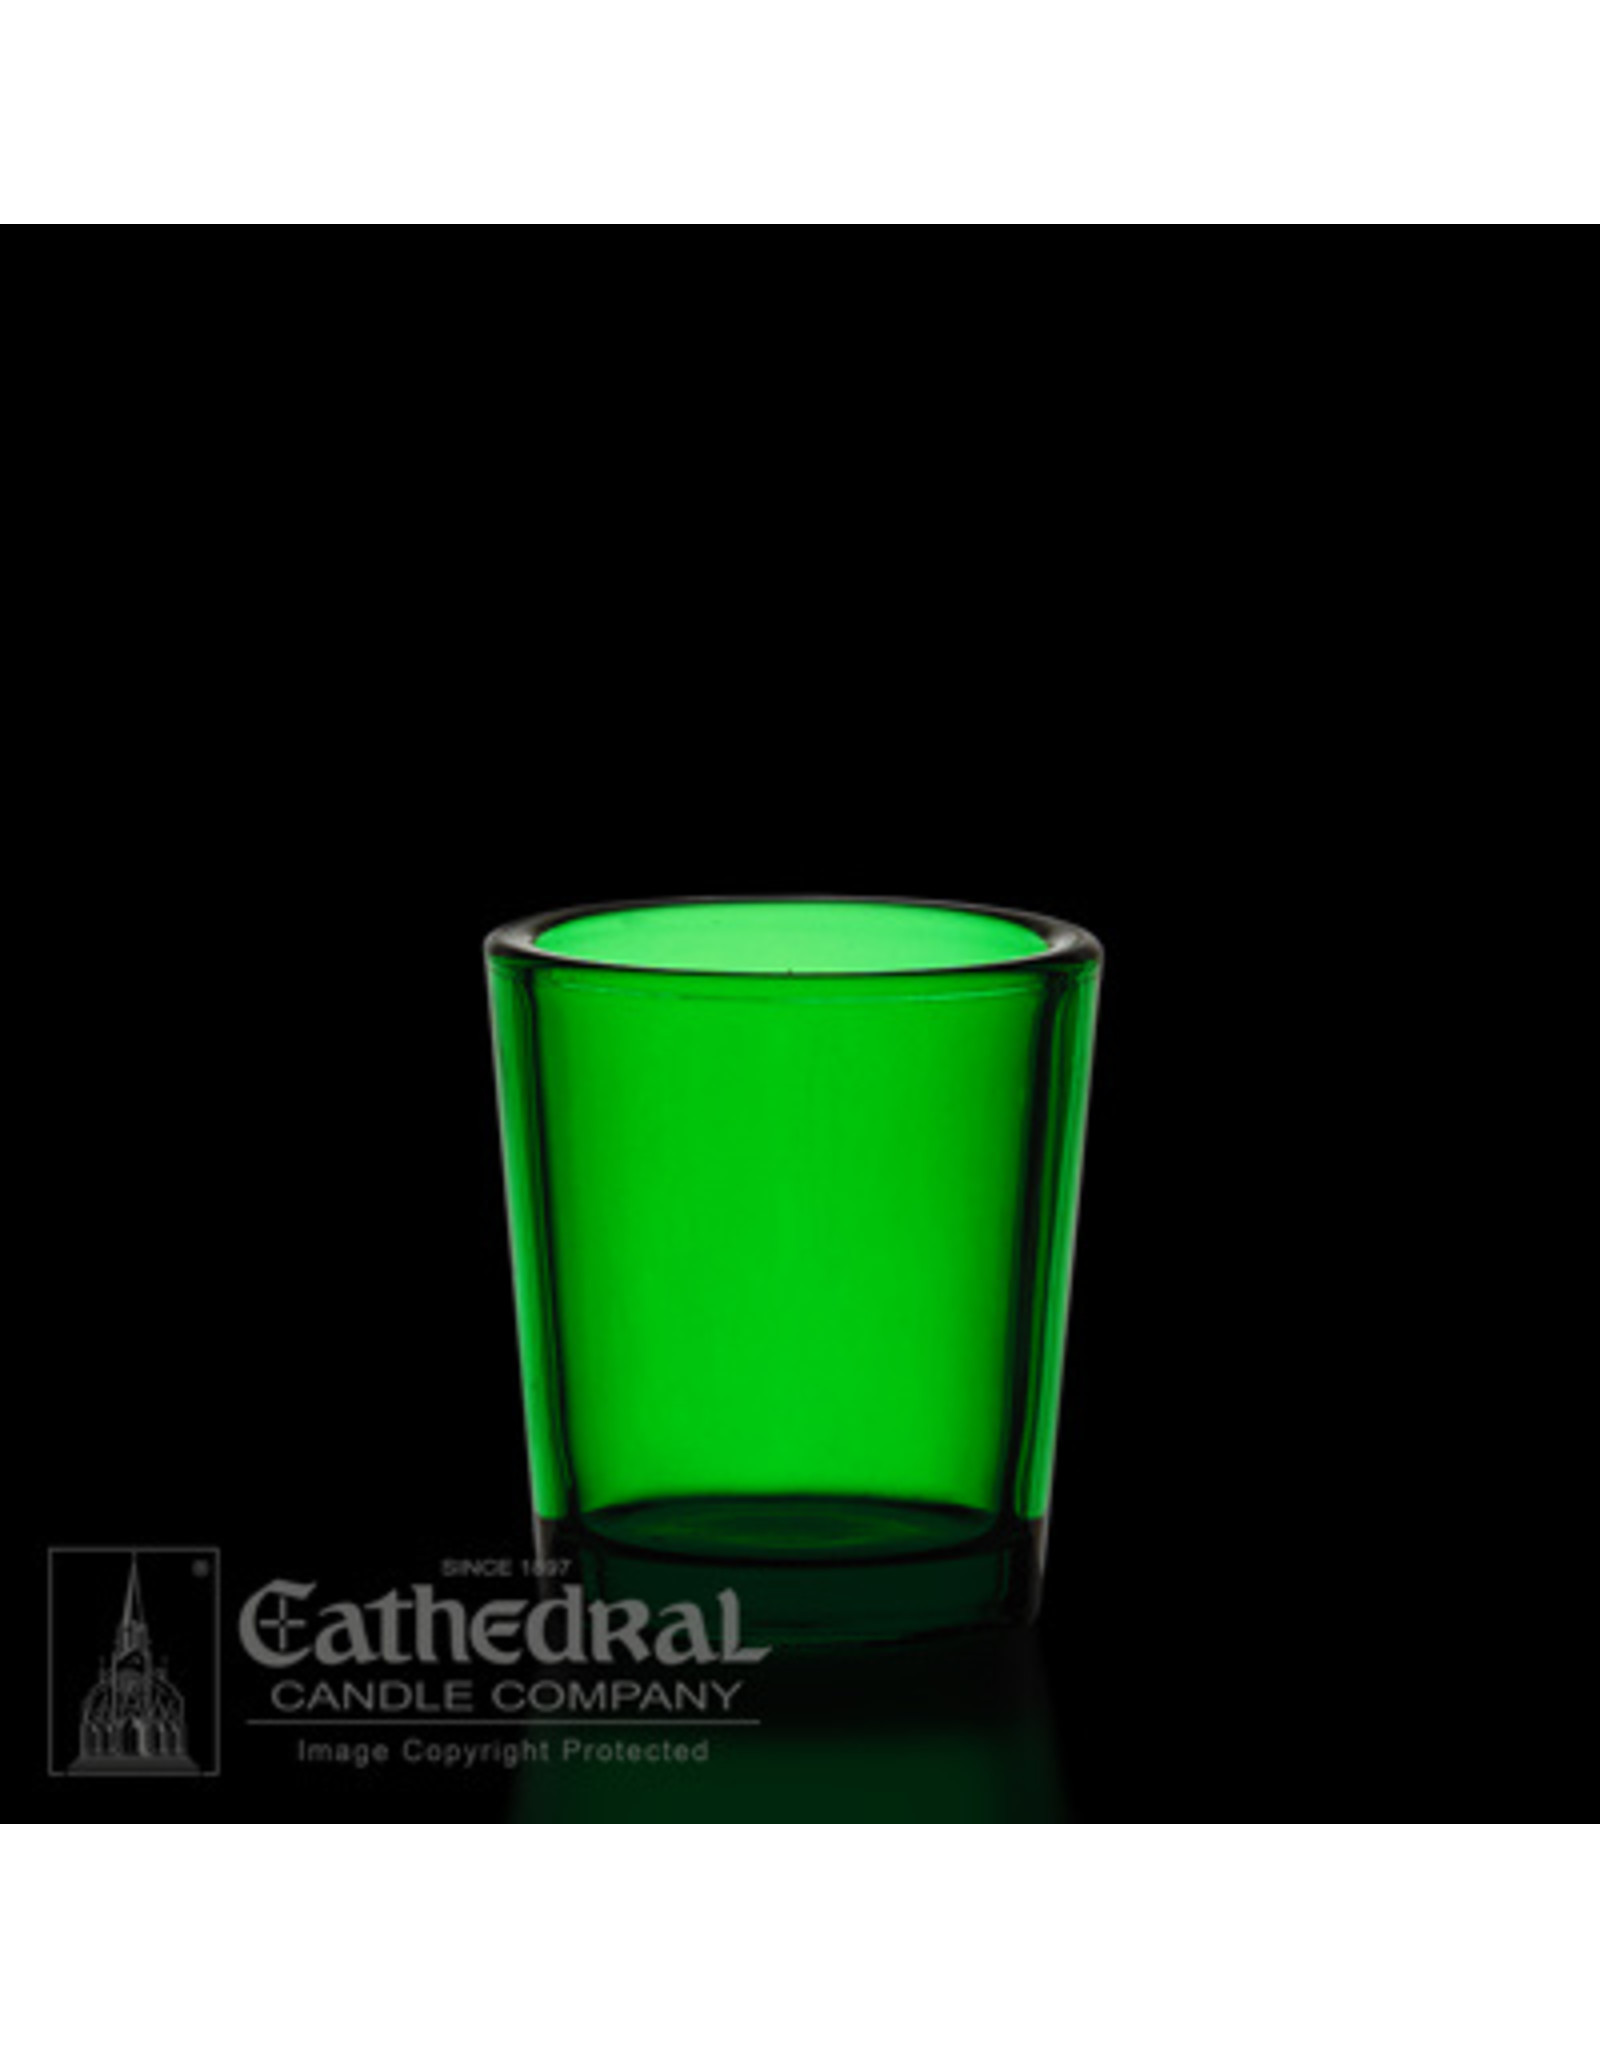 CNDL GLASS VOT 15 HR GREEN (12)